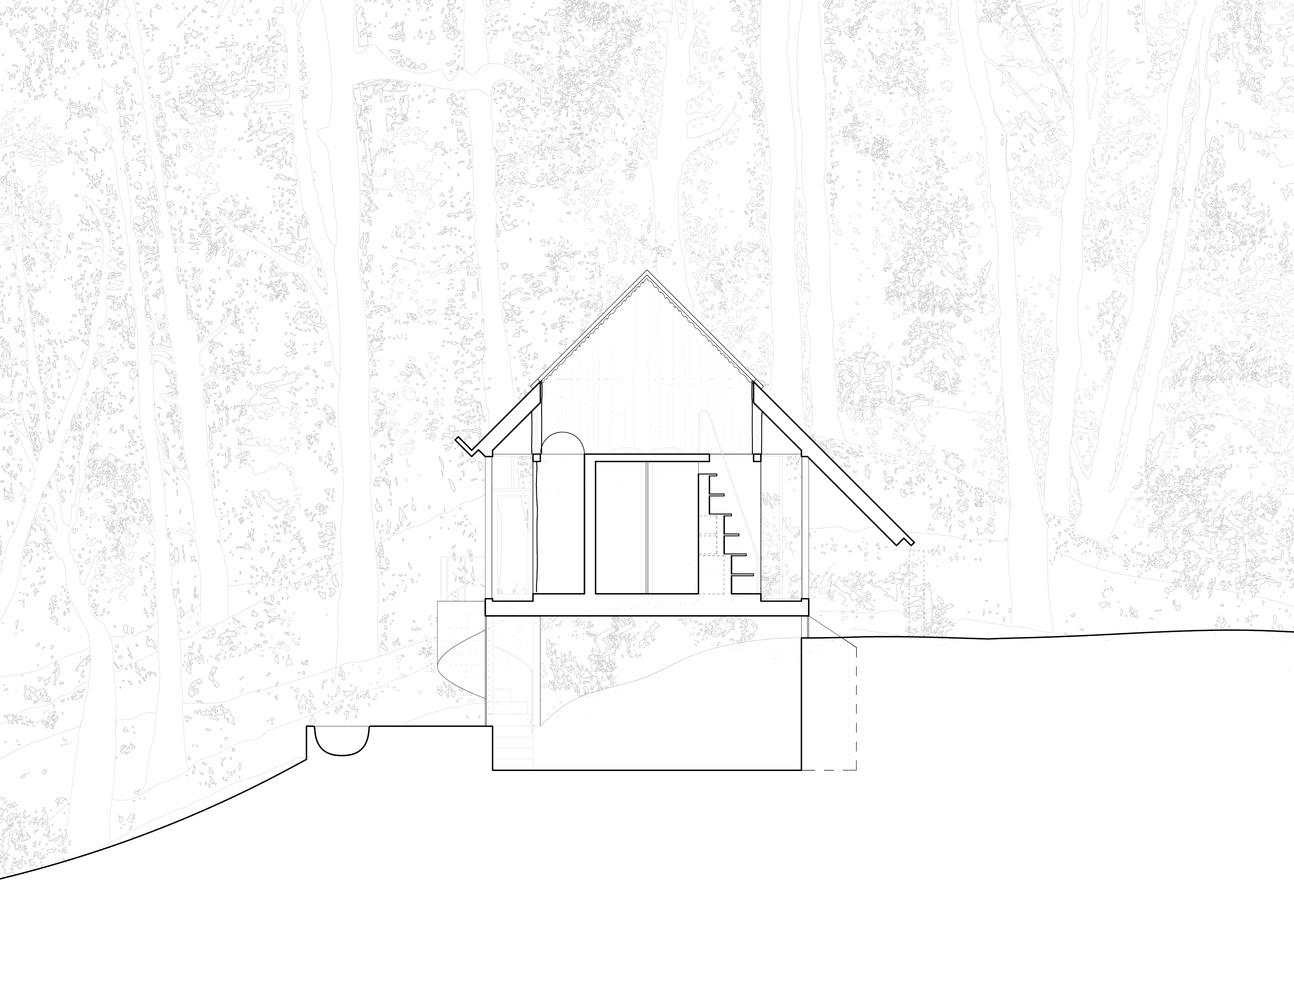 PARA-Project-.-Stump-House-.-Ben-Lomond-afasia-18.jpg